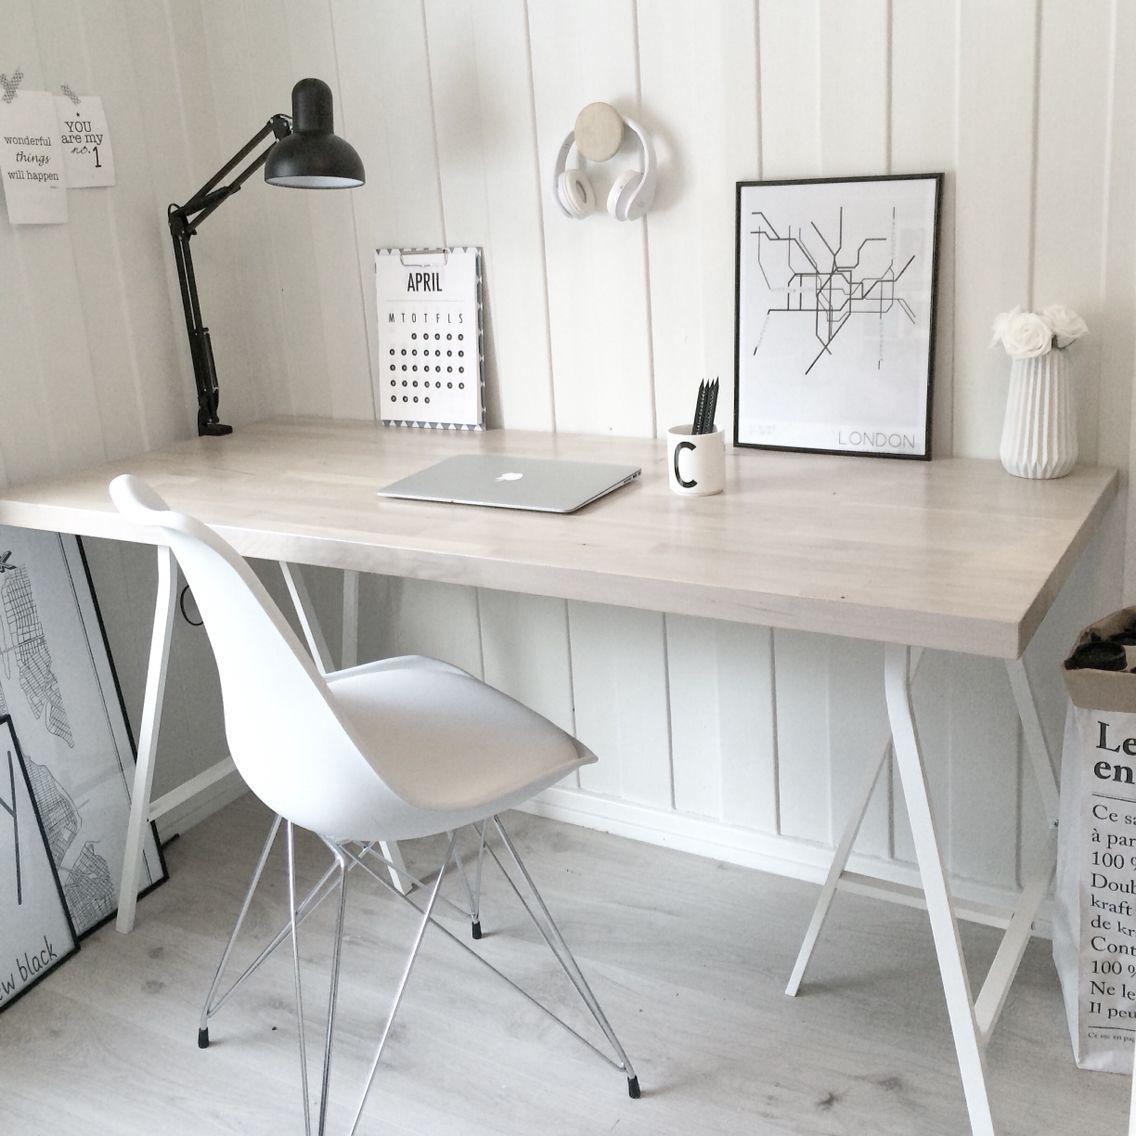 Bureau style nordique Instagram: villa_fredli